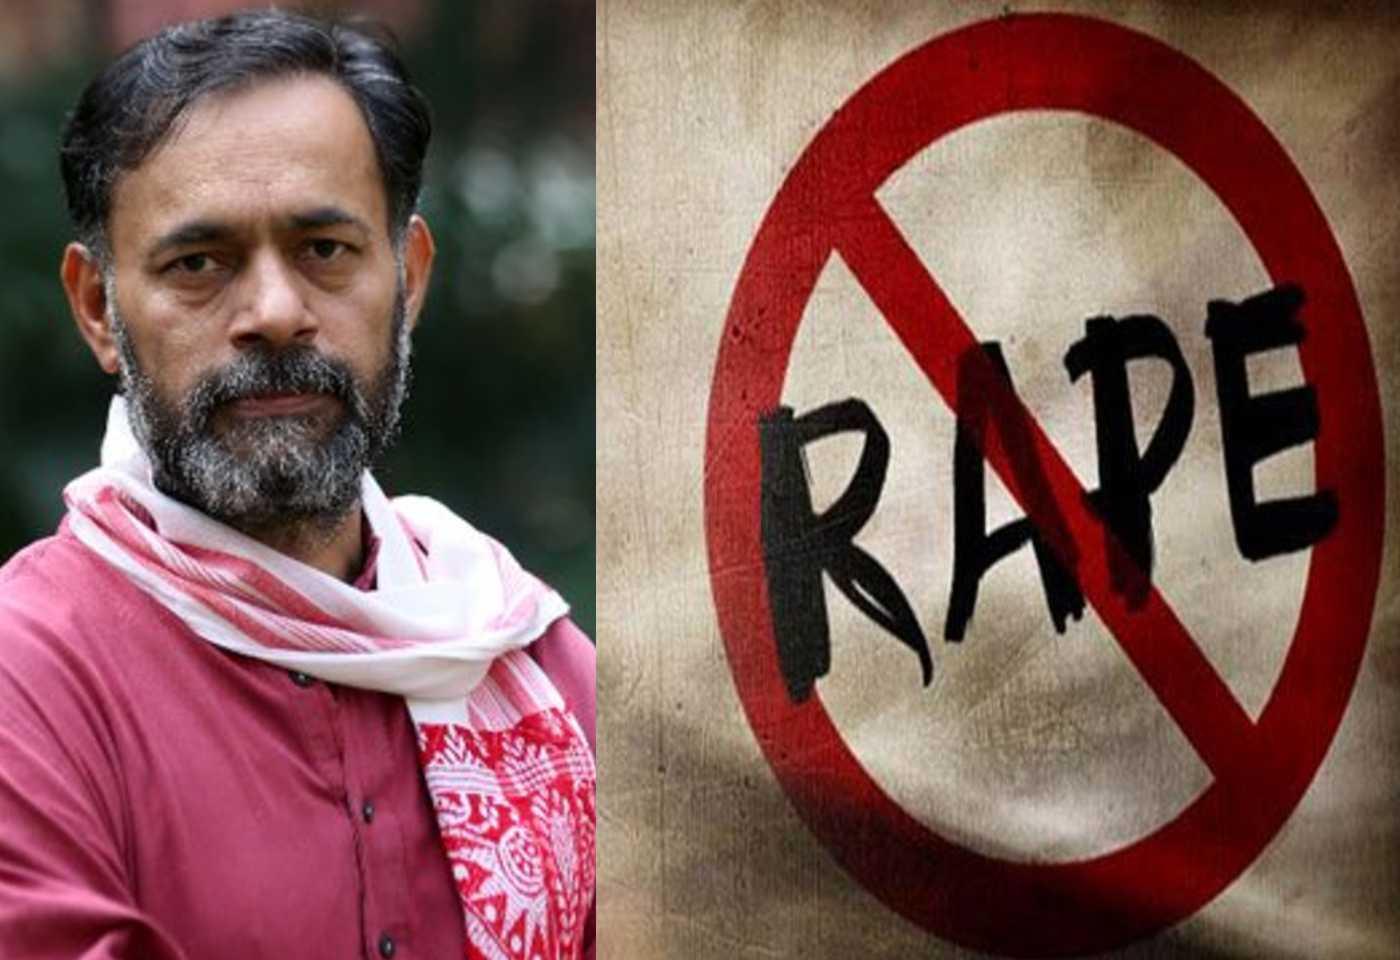 Yogendra Yadav Remains Silent On Gang Rape At Tikari Border Farmers Protest, NCW Isuues Notice, Demands Probe